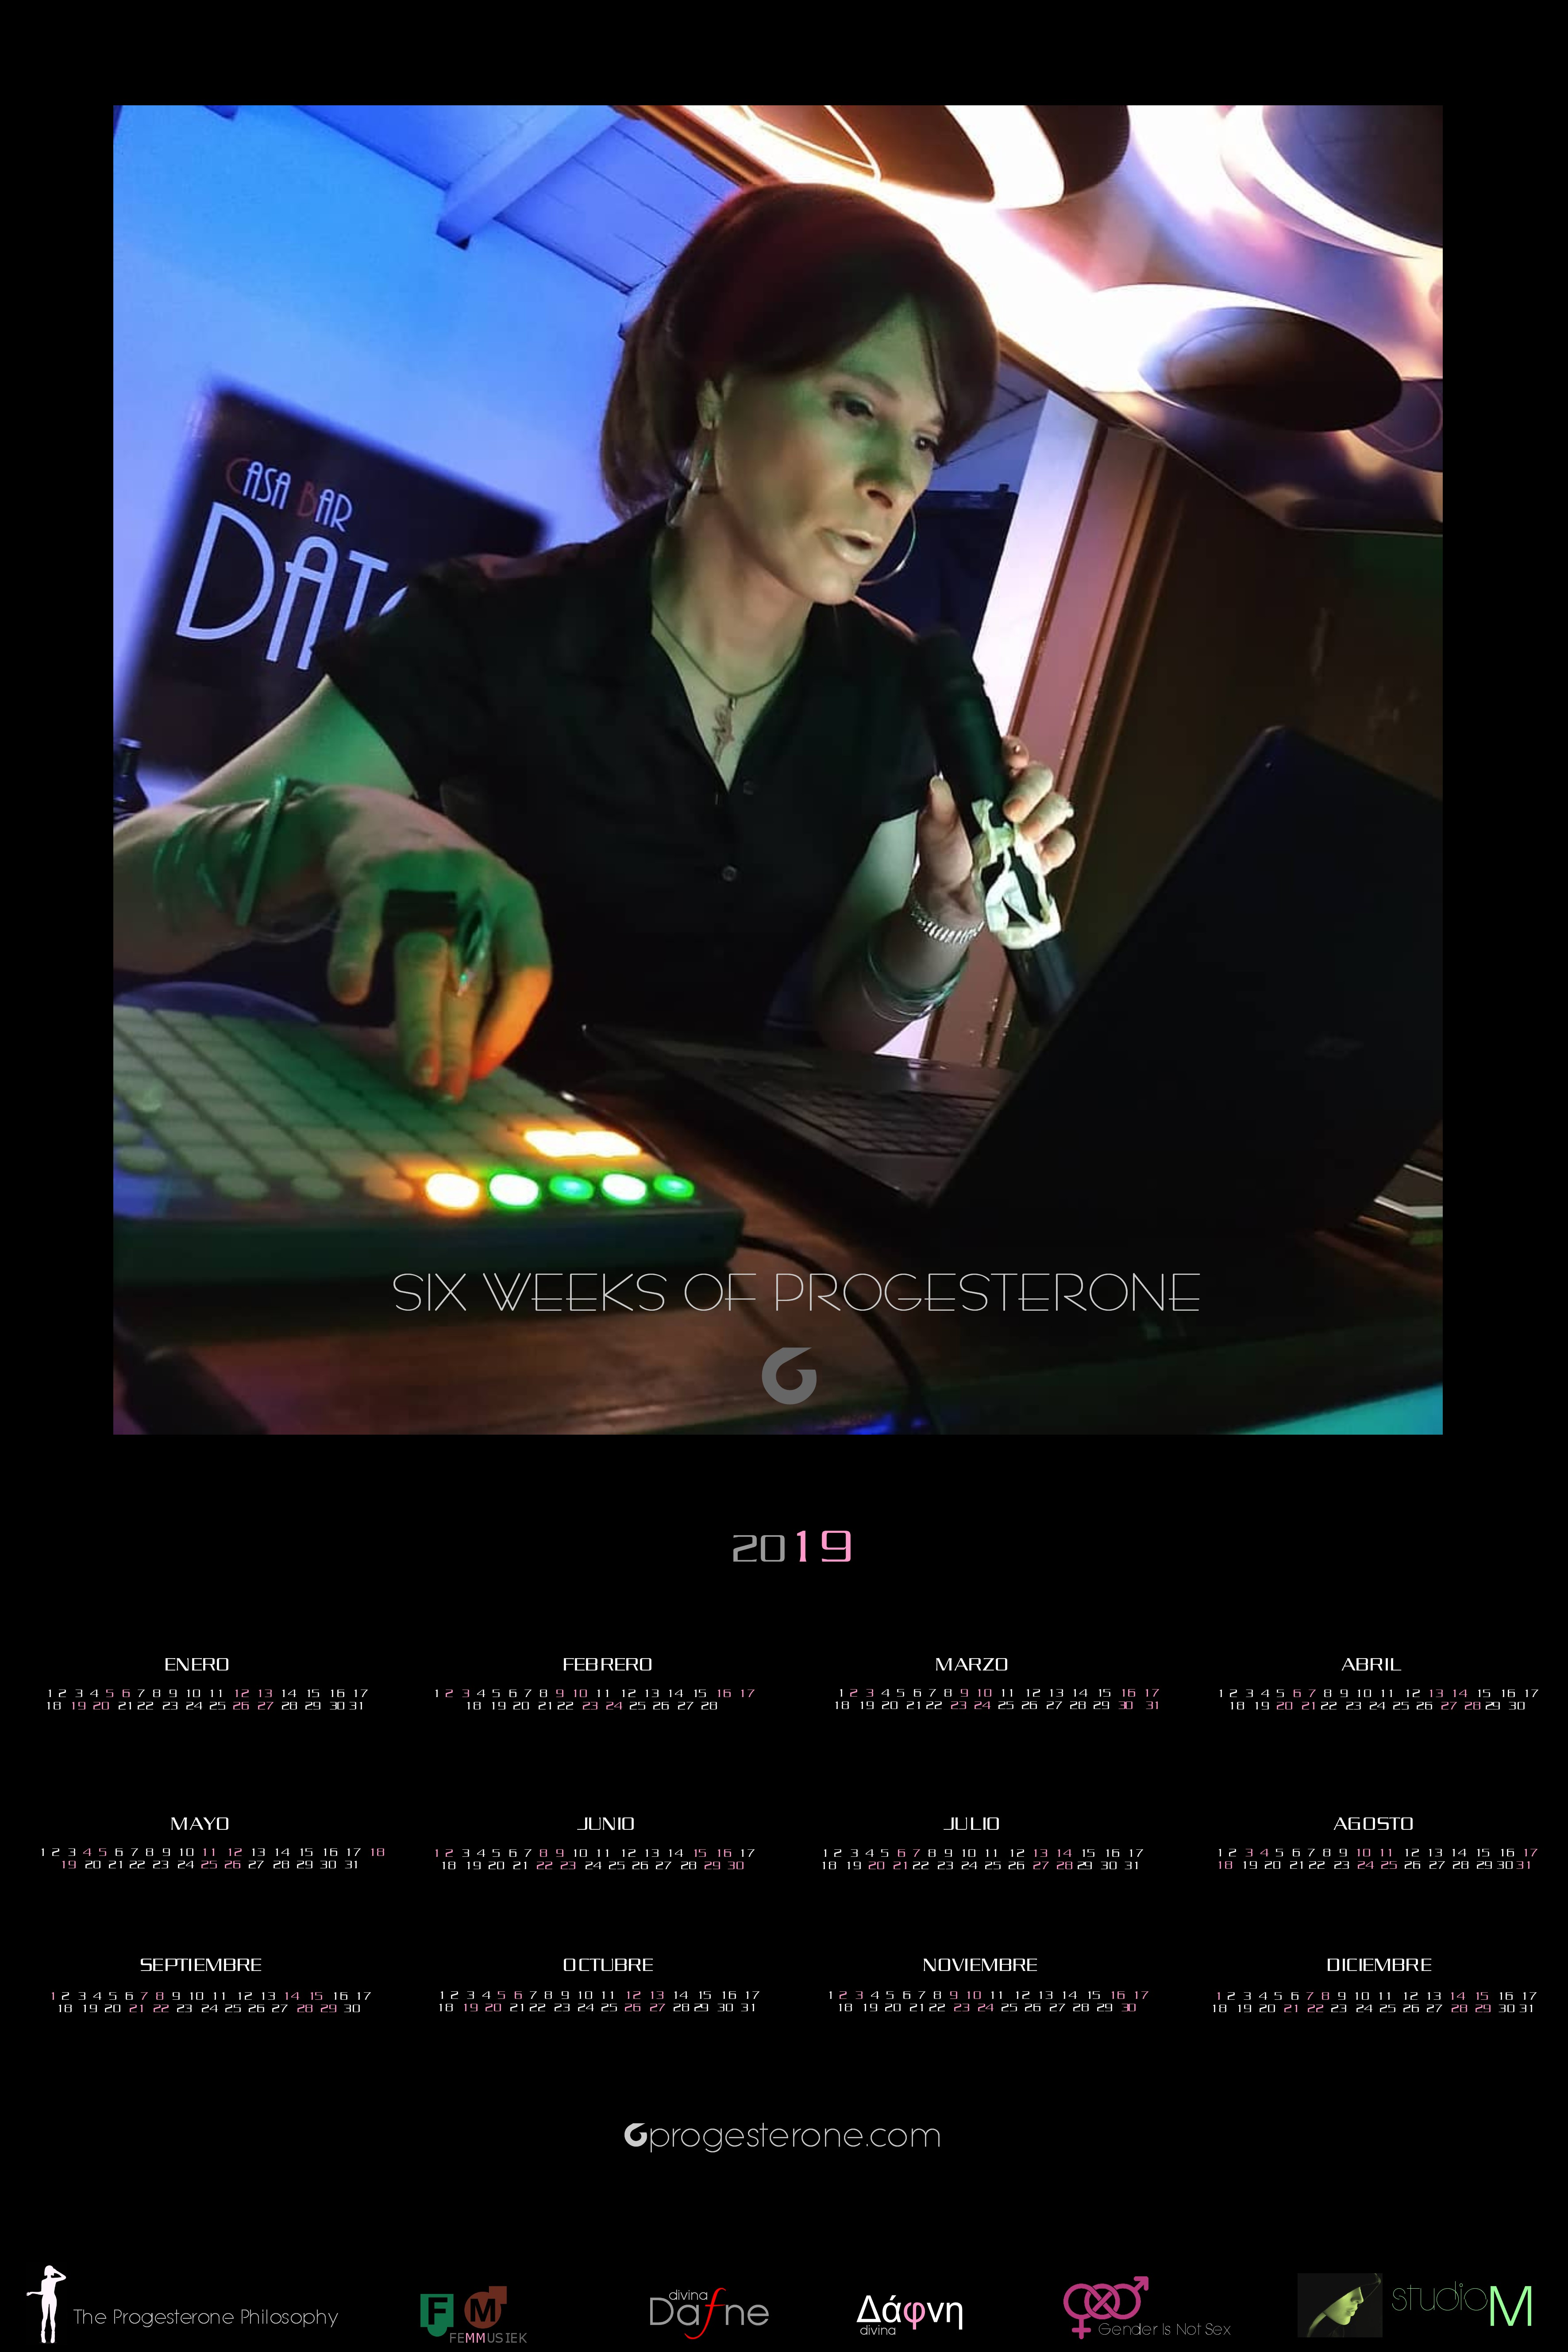 Progesterone Calendar 2019